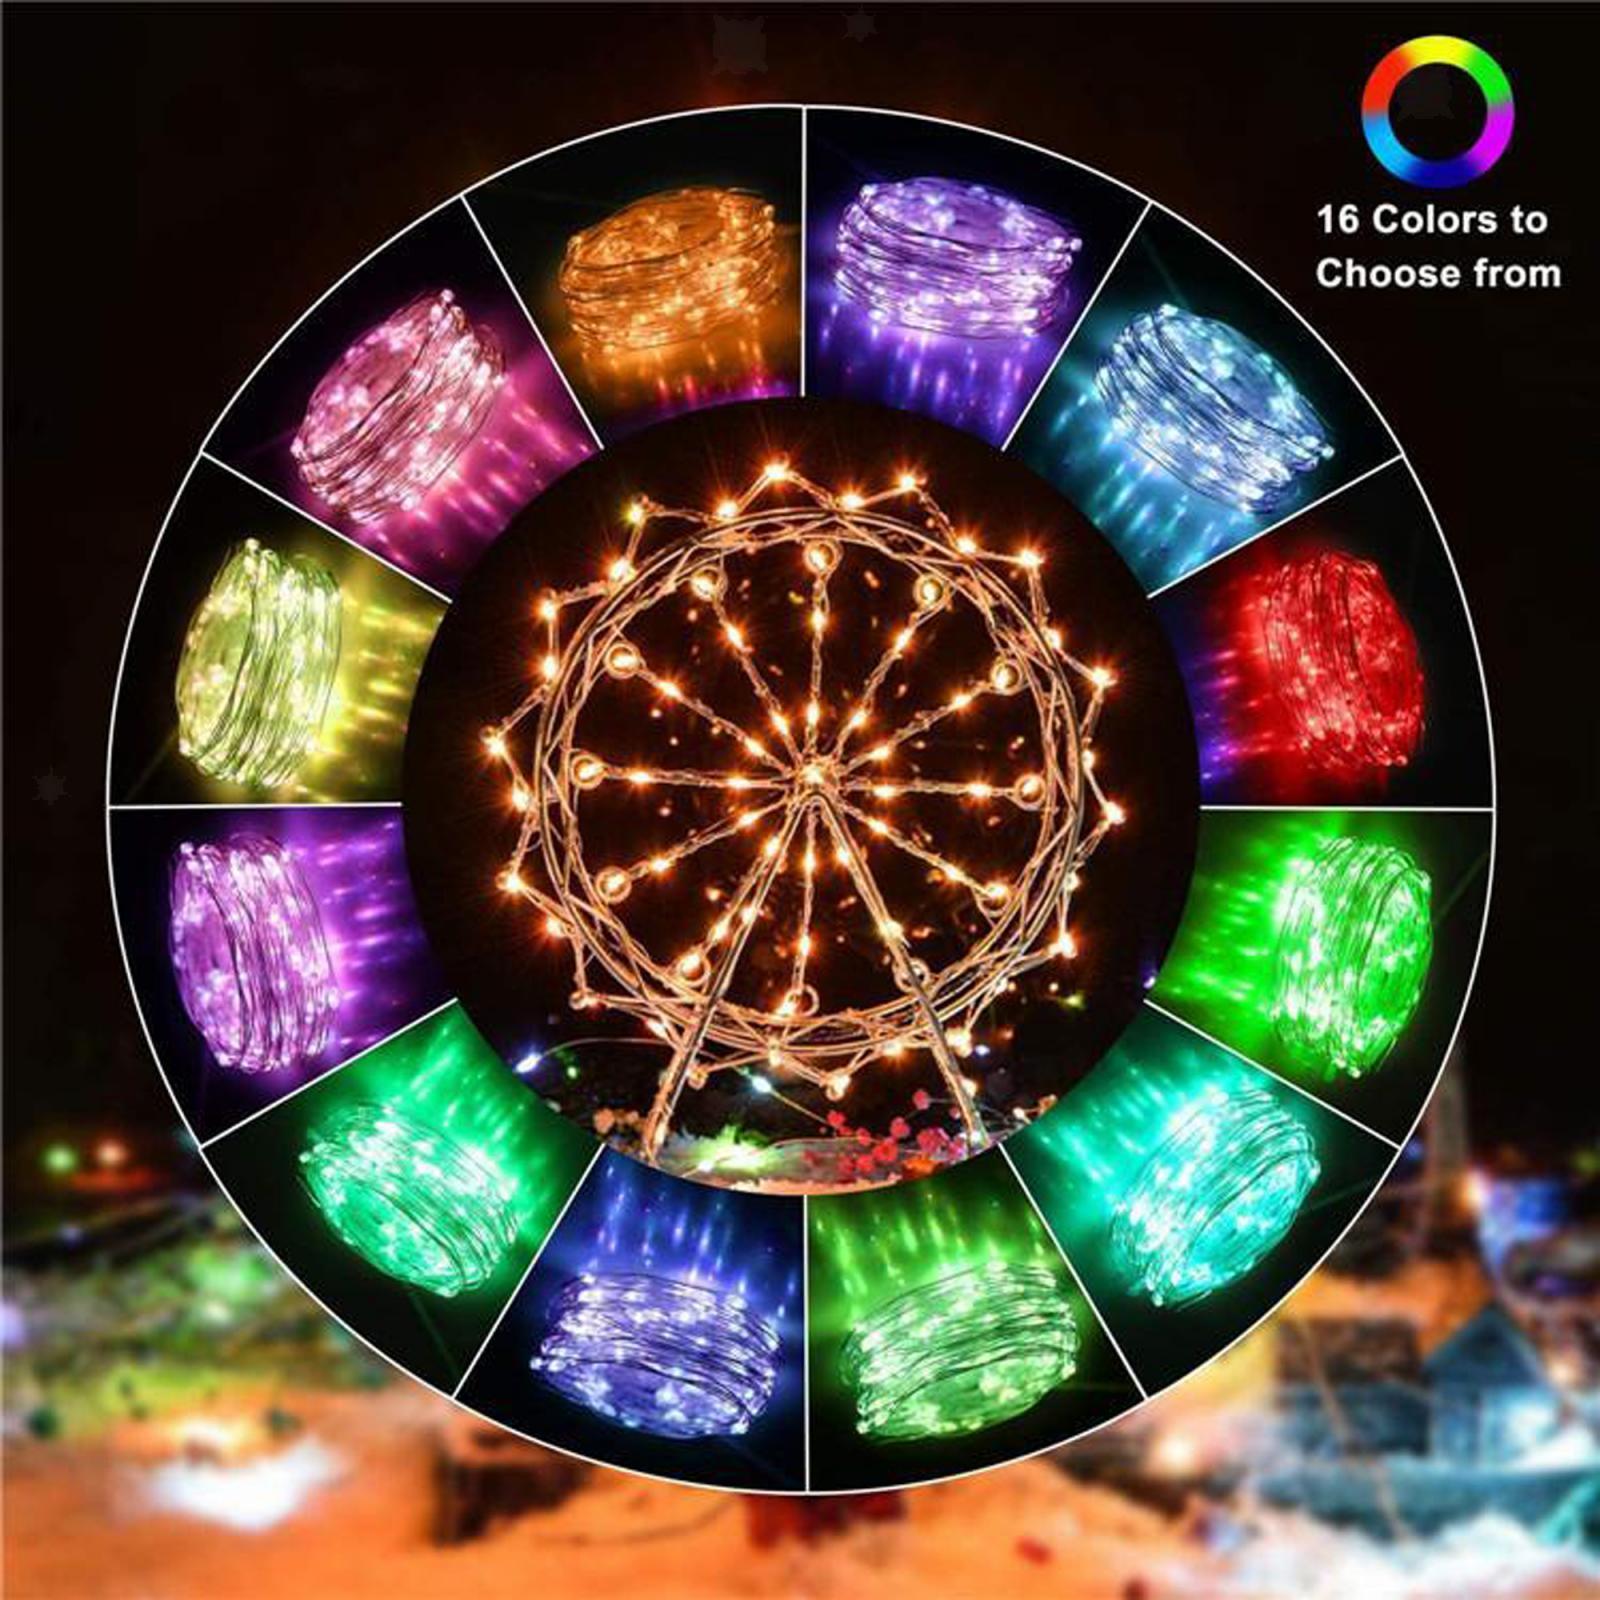 miniature 23 - LED Fée Guirlande Lumineuse Rideau Fenêtre De Mariage Party Decor App Contrôl